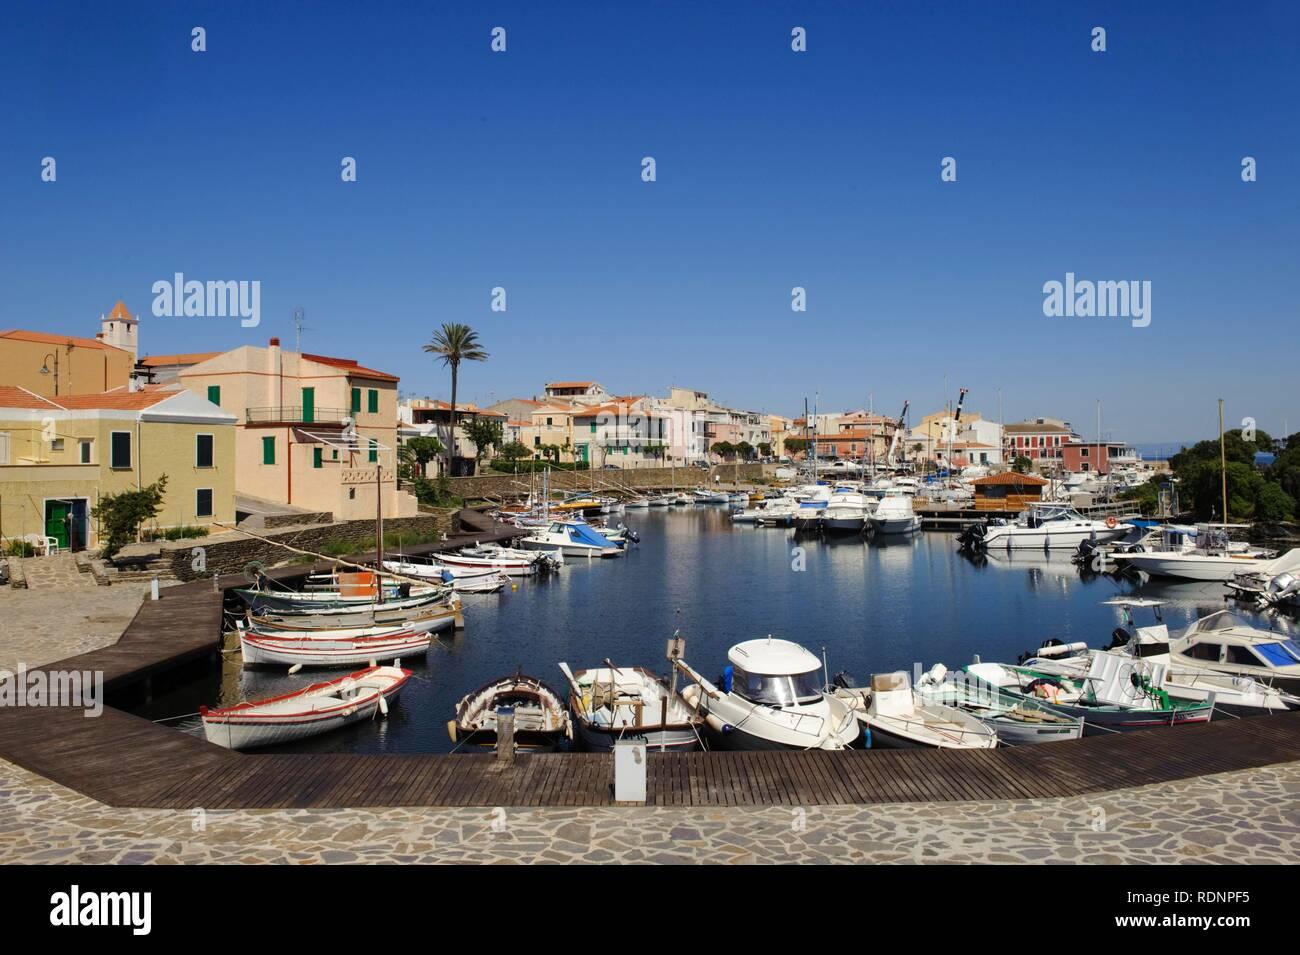 Fishing port of Stintino, Sassari Province, Northern Sardinia, Italy, Europe - Stock Image